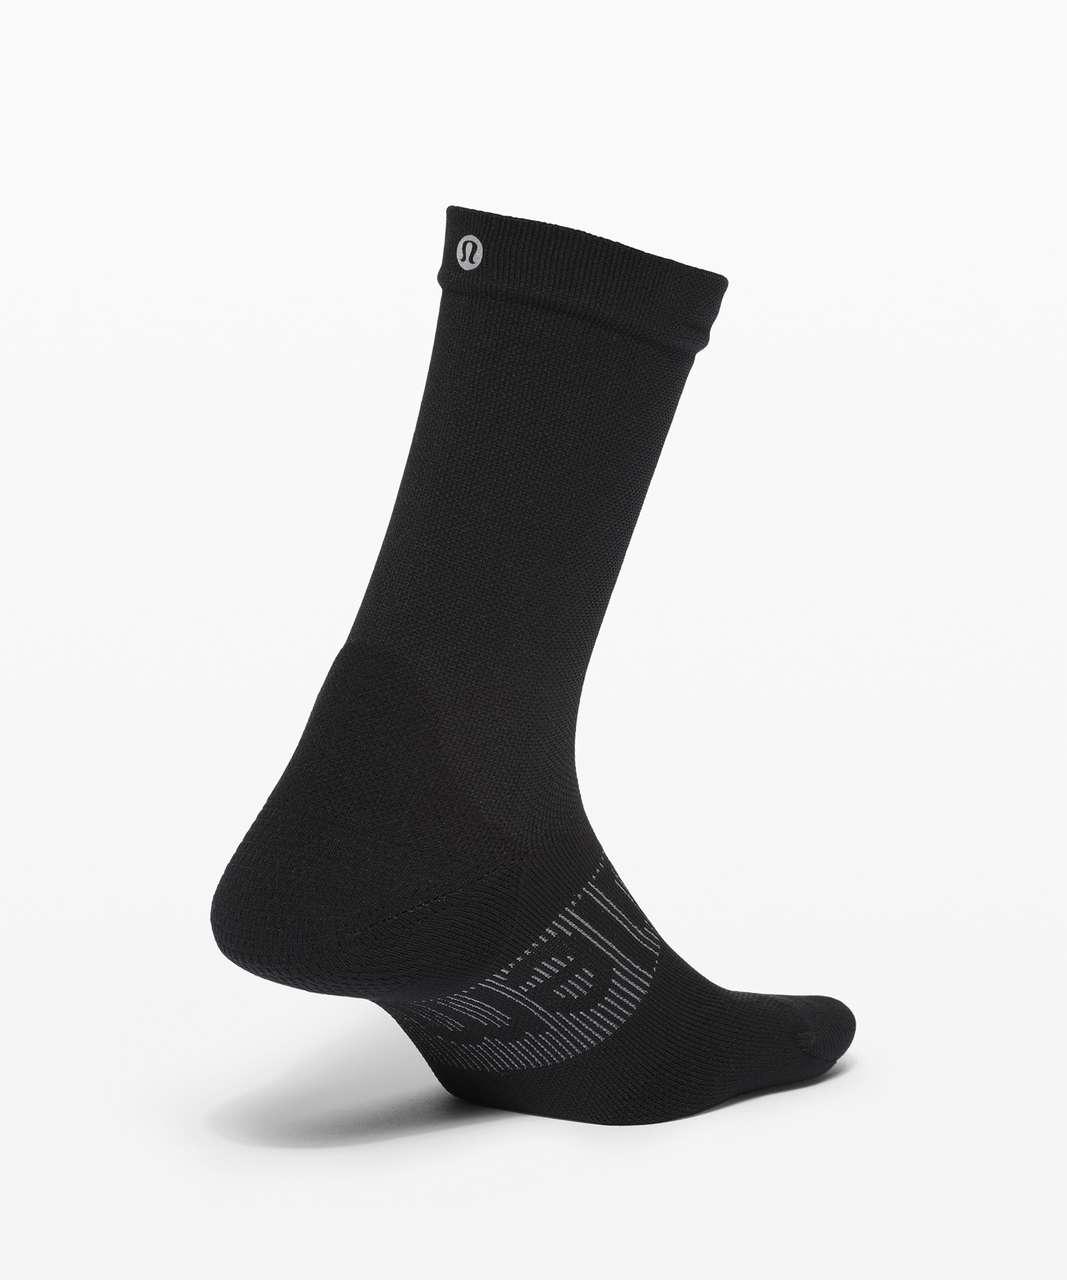 Lululemon Power Stride Crew Sock *Wordmark - Black